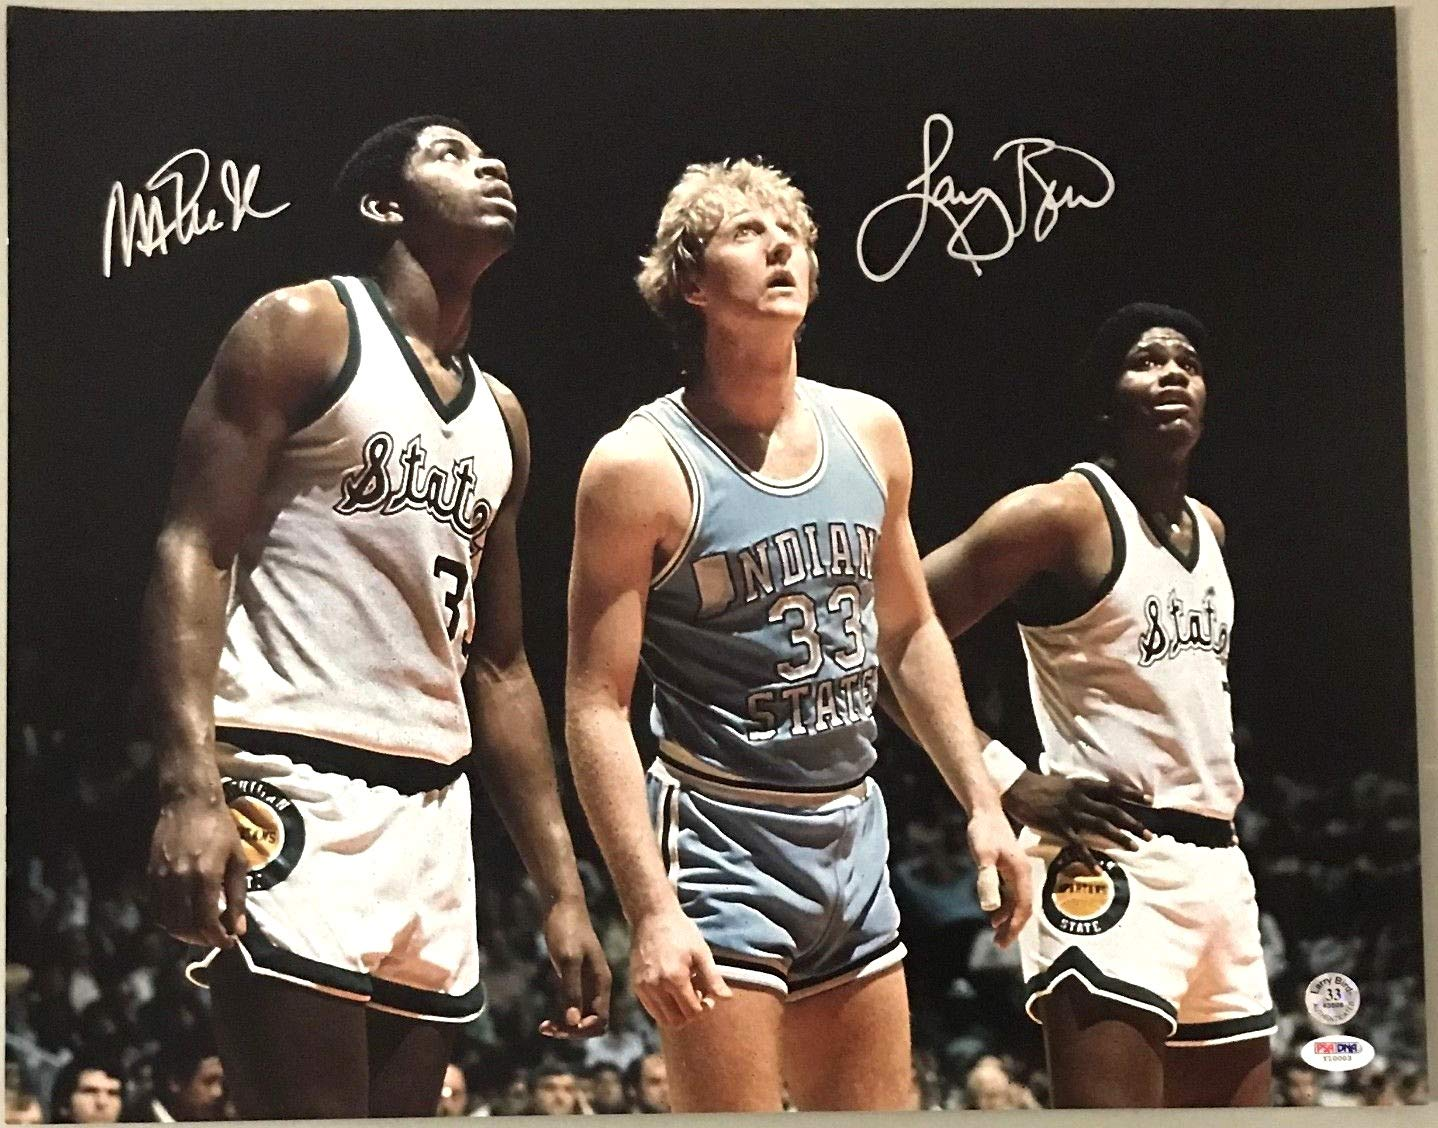 Larry Bird & Magic Johnson reprint 8x10 Photo Michigan State vs Indiana State